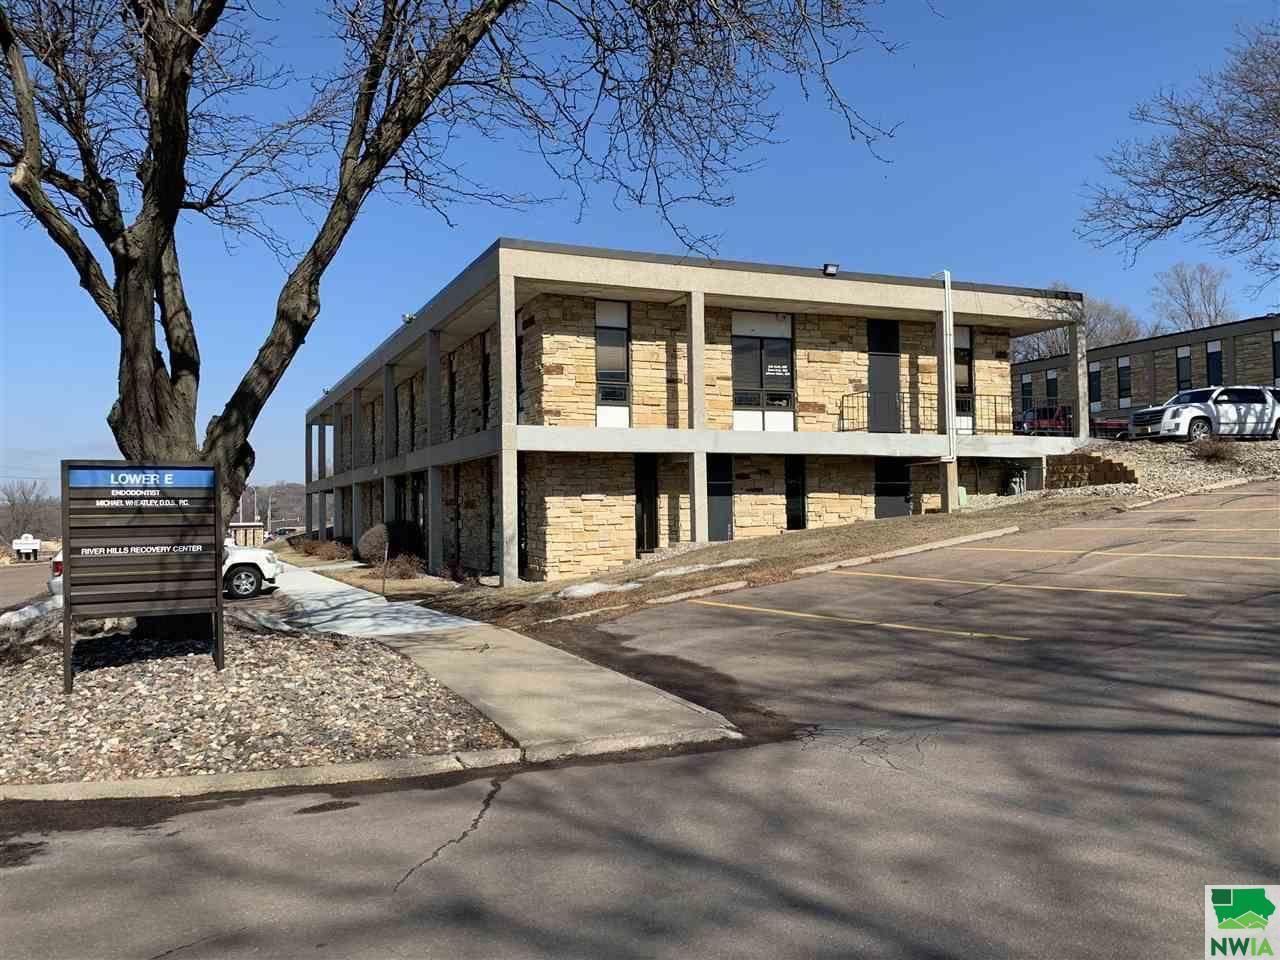 Photo for 2928 Hamilton Blvd 102, Sioux City, IA 51104 (MLS # 808149)